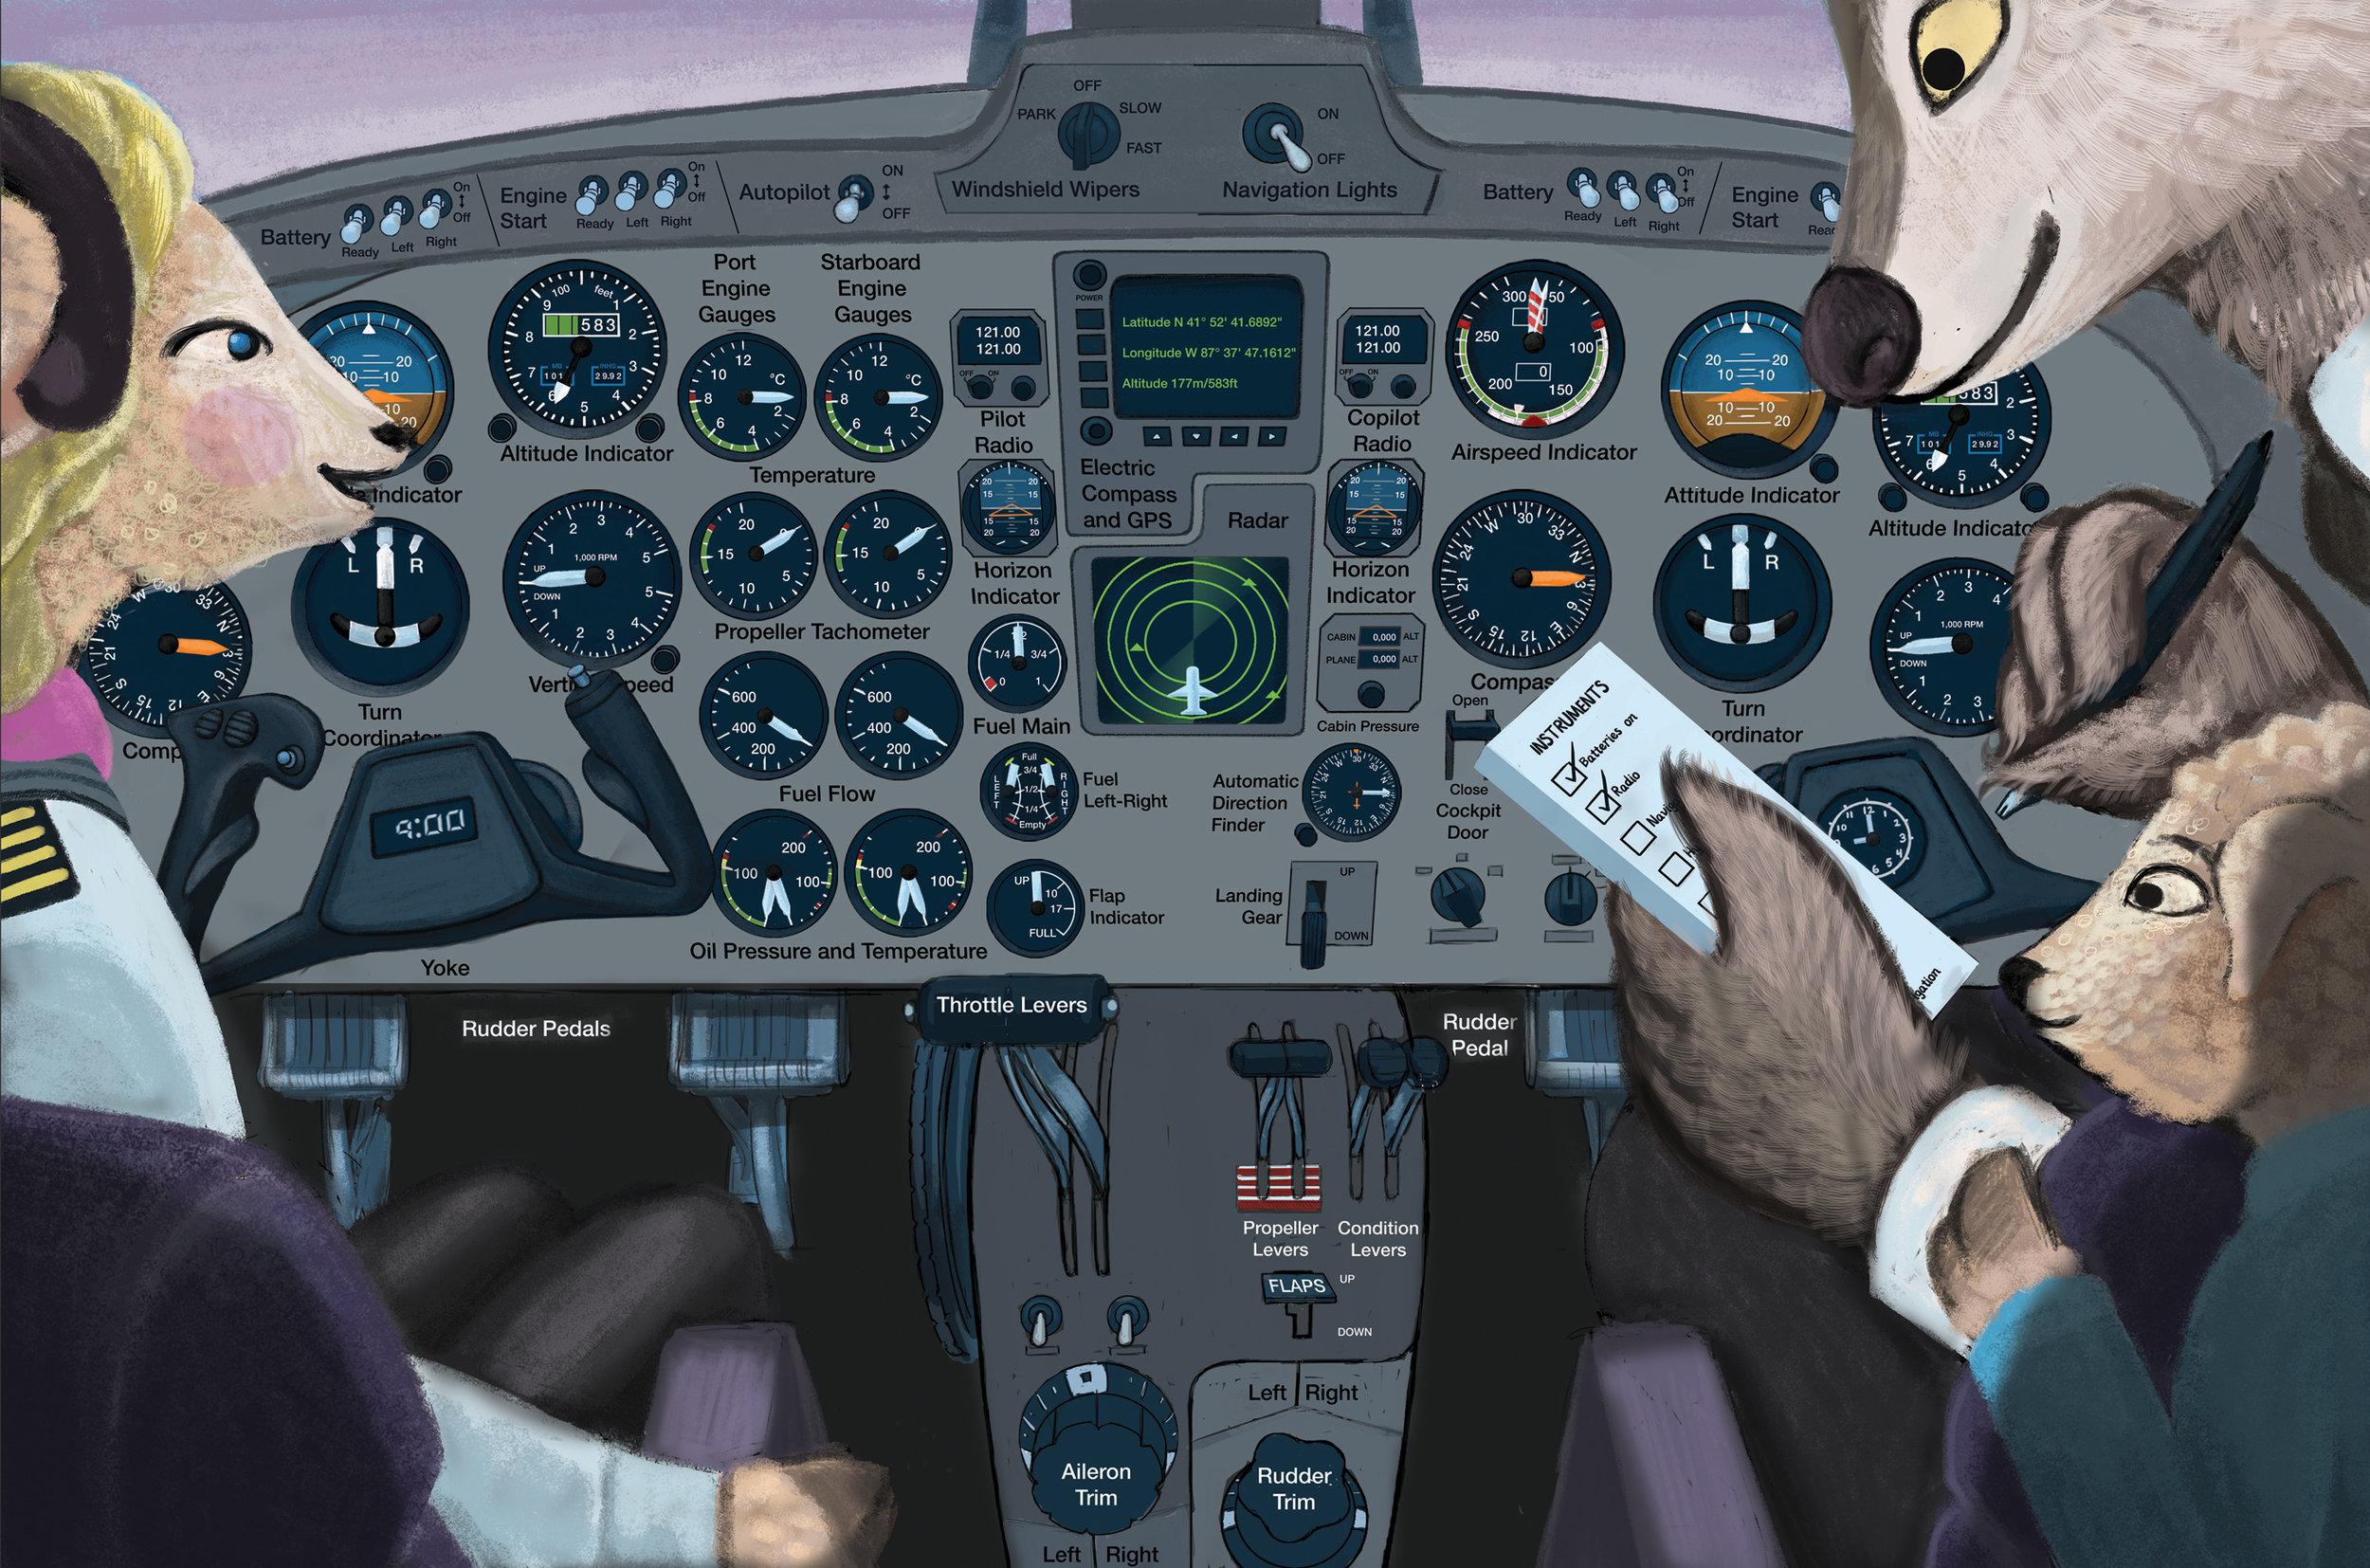 p18-19_cockpit_instruments.jpg